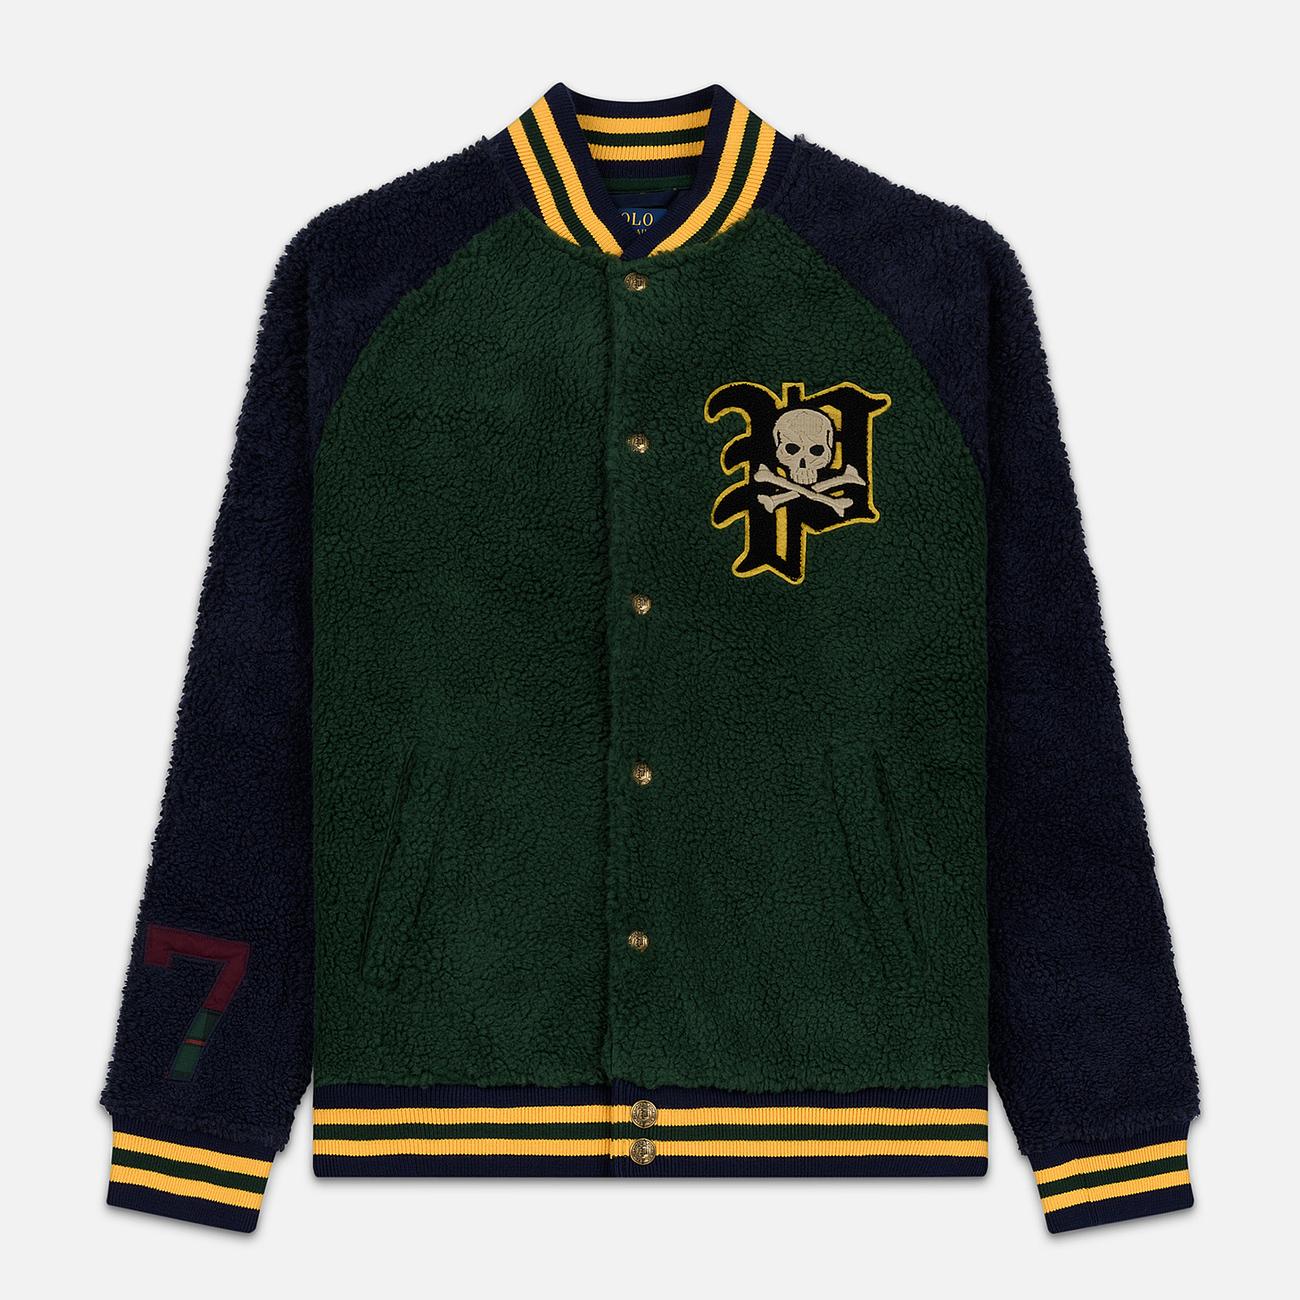 Мужская куртка бомбер Polo Ralph Lauren Fleece Letterman College Green/Cruise Navy